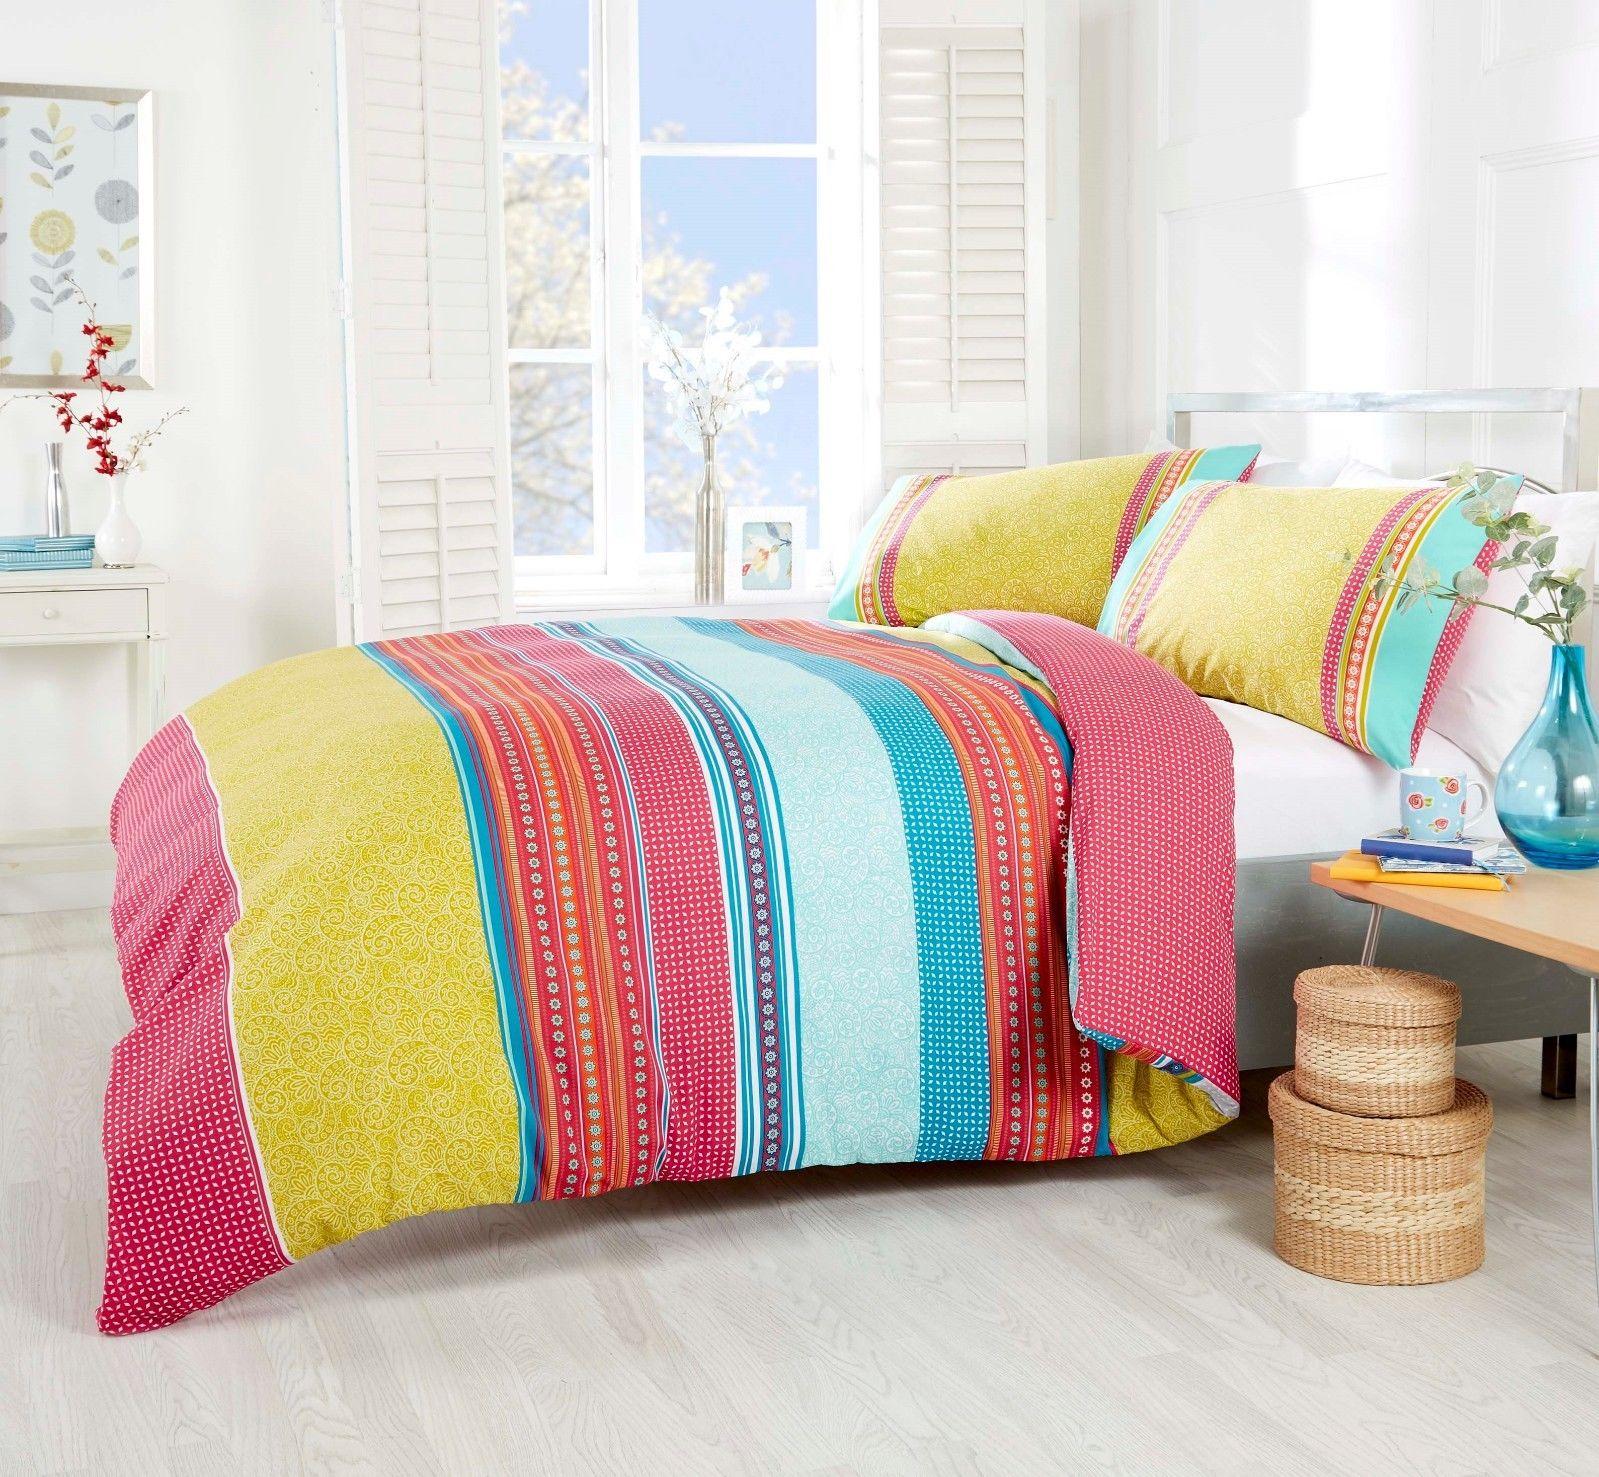 Duvet Covers & Sets Paisley Duvet Cover Reversible Quilt Set With Pillowcases Single Double King Home & Garden